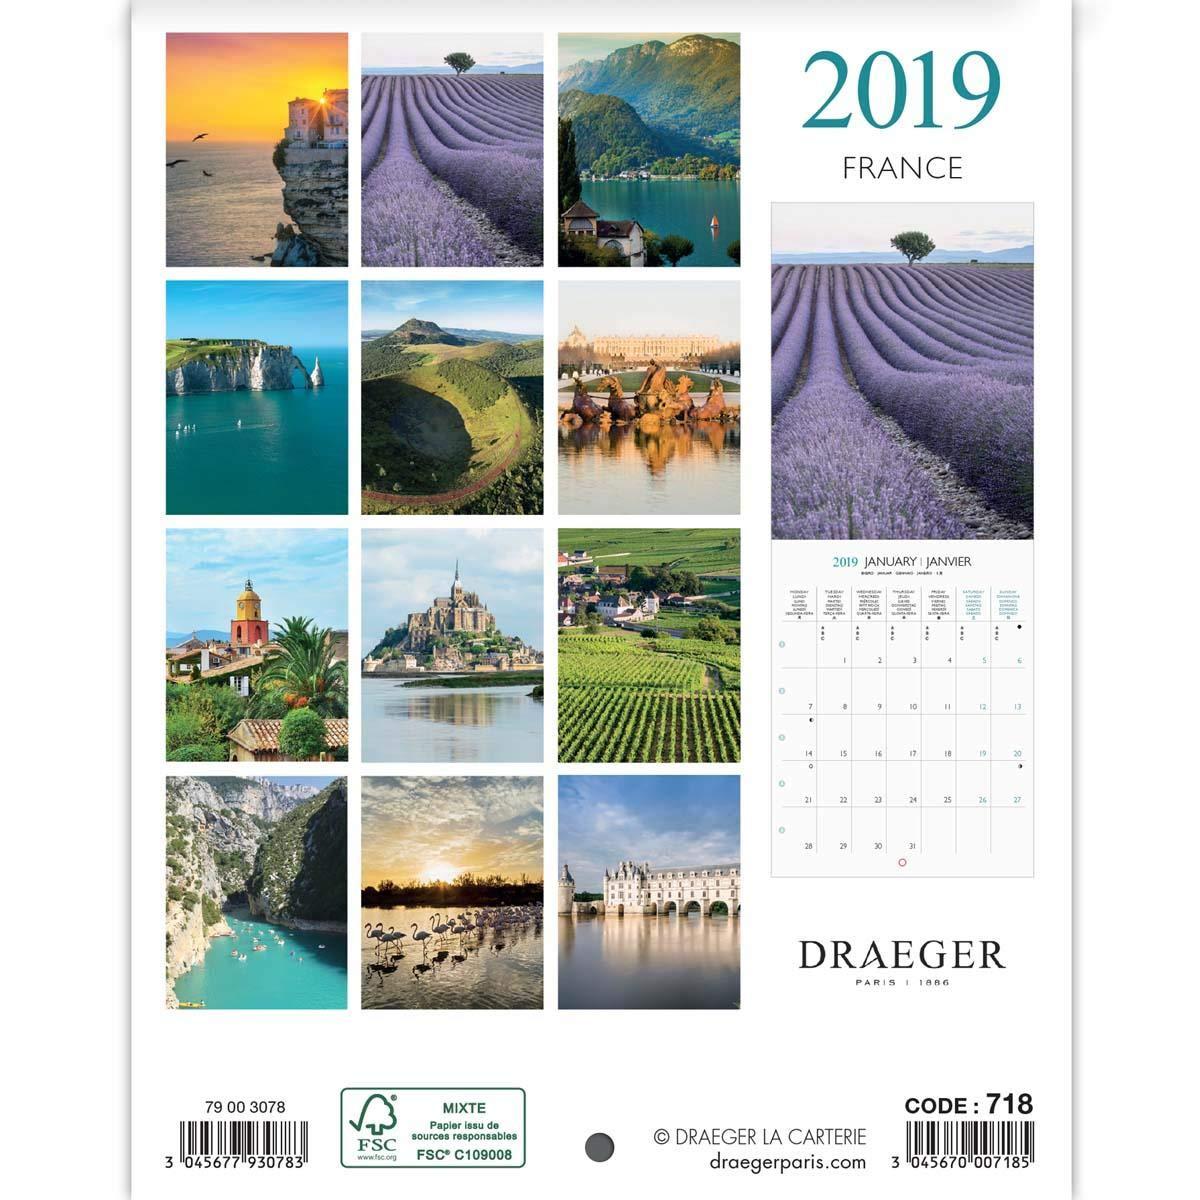 DRAEGER Kalender Frankreich 2019 18 18 18 x 14,5 cm 10 Stück B07HVM3846      Exquisite (in) Verarbeitung  e7ff97